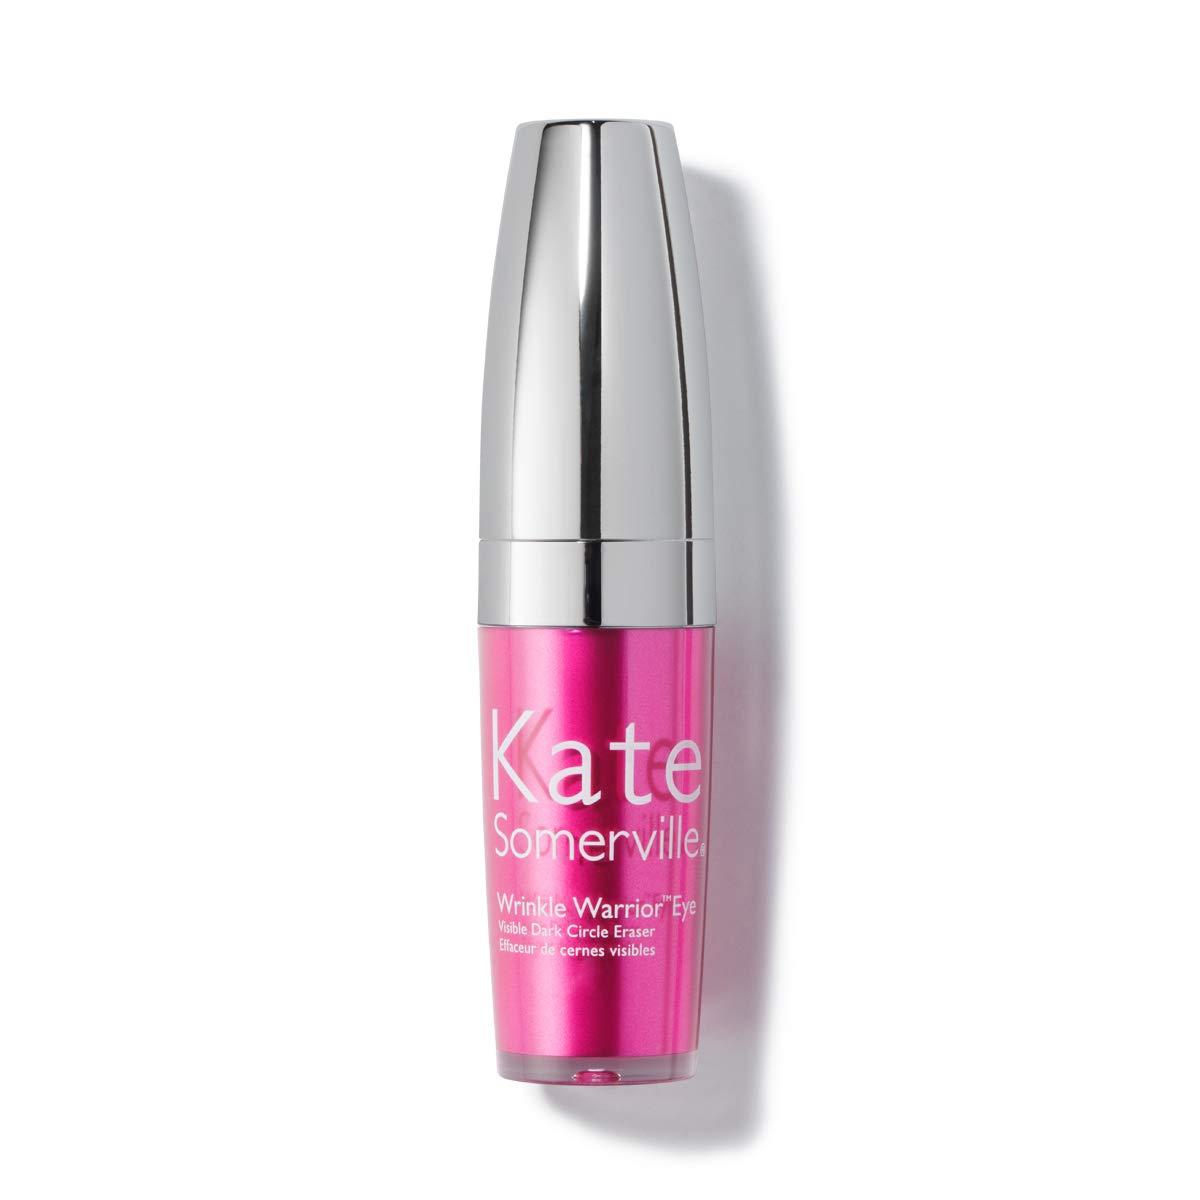 Kate Somerville Wrinkle Warrior Eye Gel by Kate Somerville